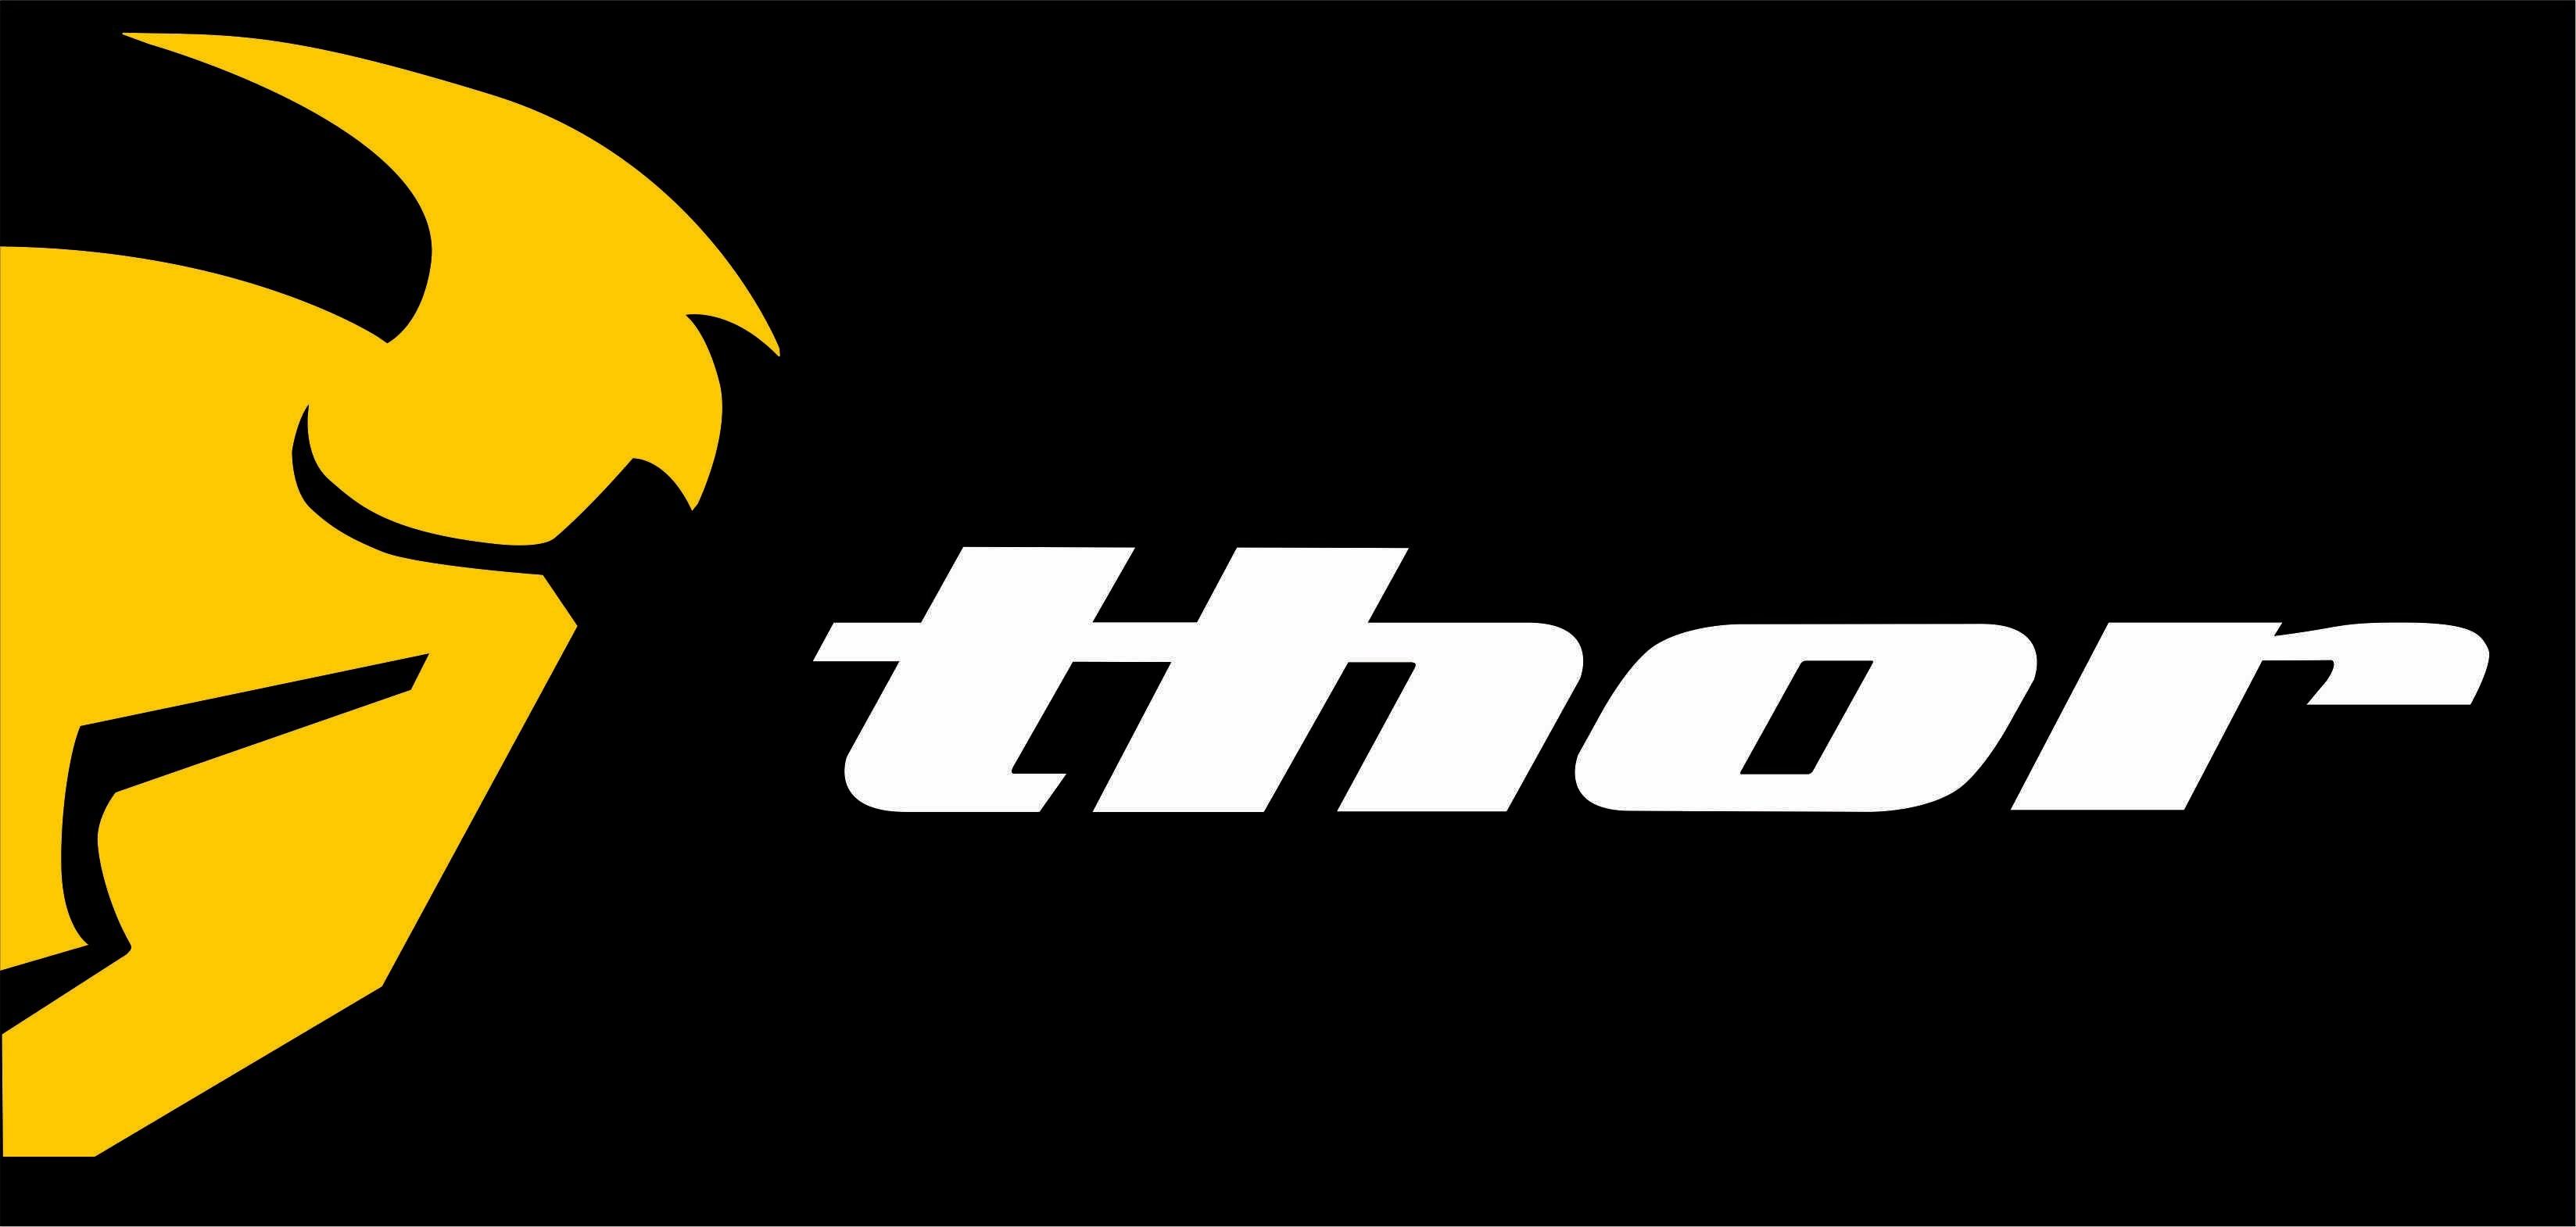 Iphone 5 Fox Racing Wallpaper Data Src Motocross Logo De Thor 3295x1570 Wallpaper Teahub Io